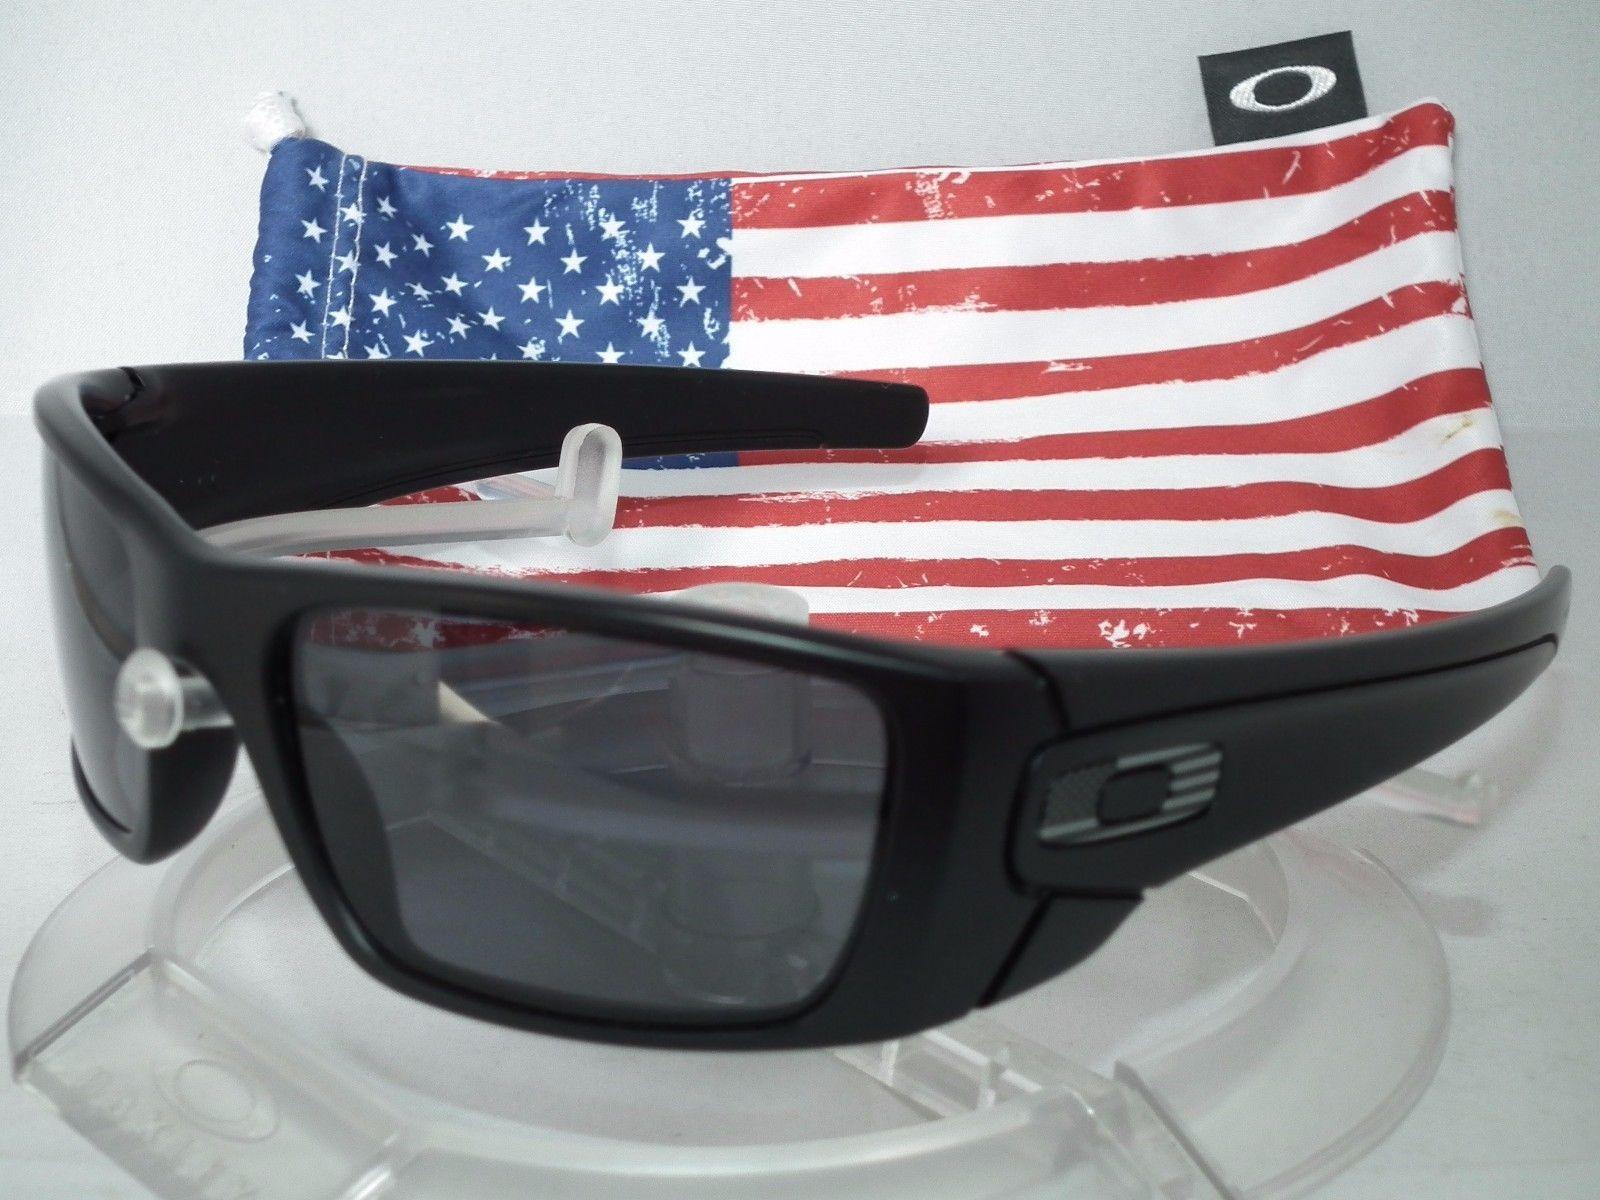 98c5f13dd35d2 ... czech oakley si fuel cell sunglasses oo9096 29 matte black grey tonal  usa flag icons 6e48b